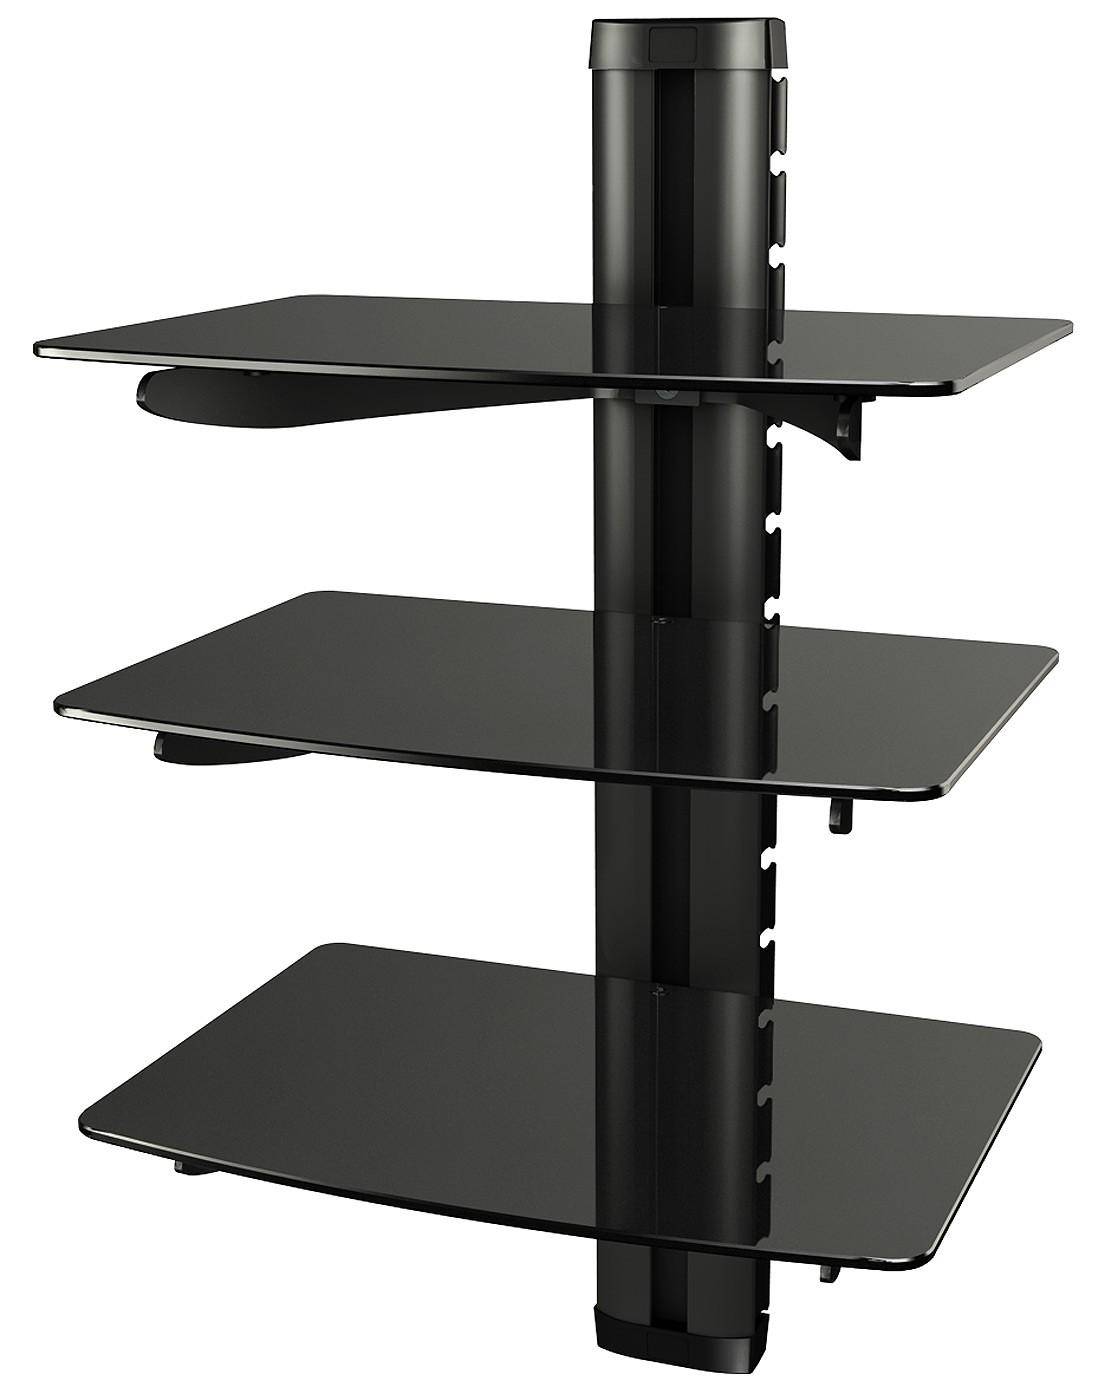 dvd regal glas wand glasregal hifi wandboard halterung ebay. Black Bedroom Furniture Sets. Home Design Ideas